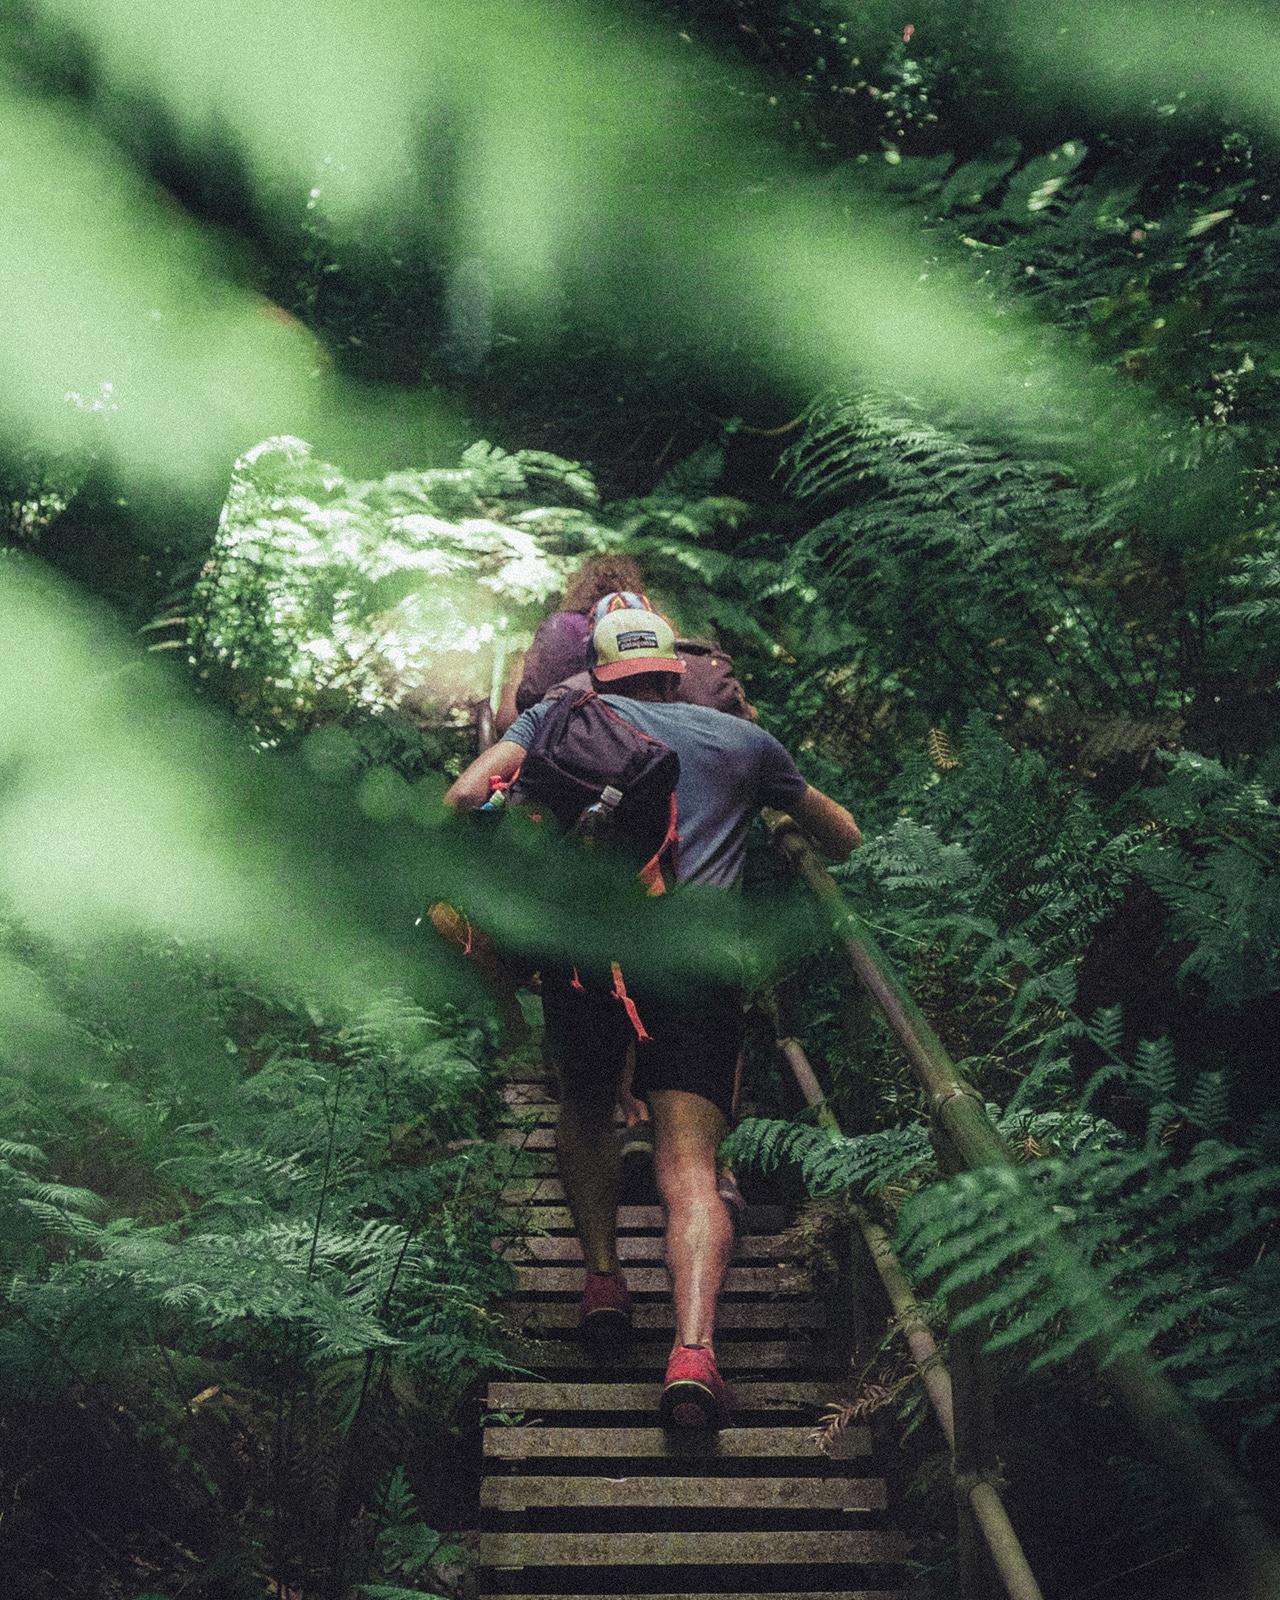 hiking dress code